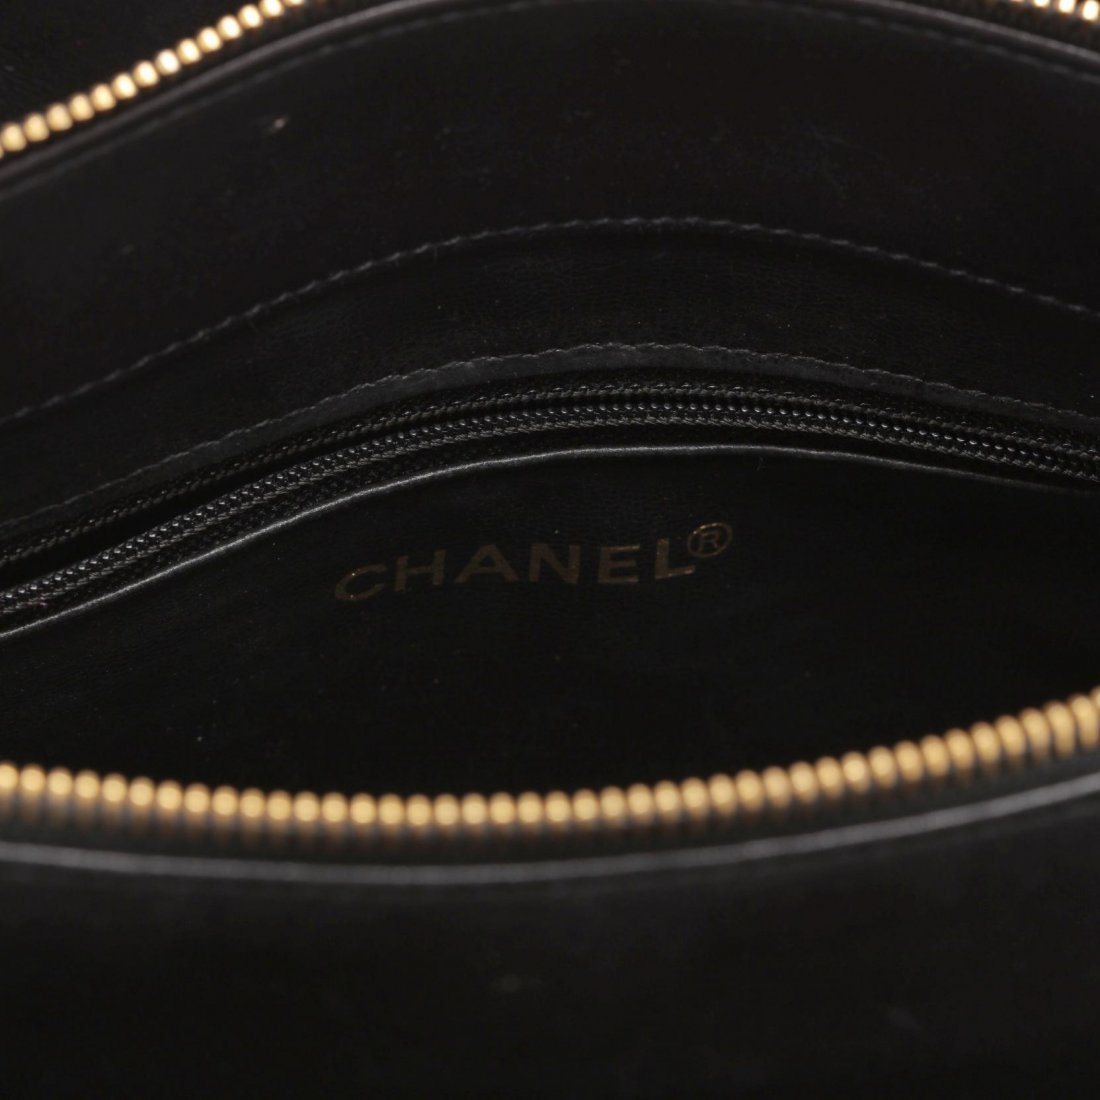 Vintage Lambskin Chevron Handbag, Chanel - 6